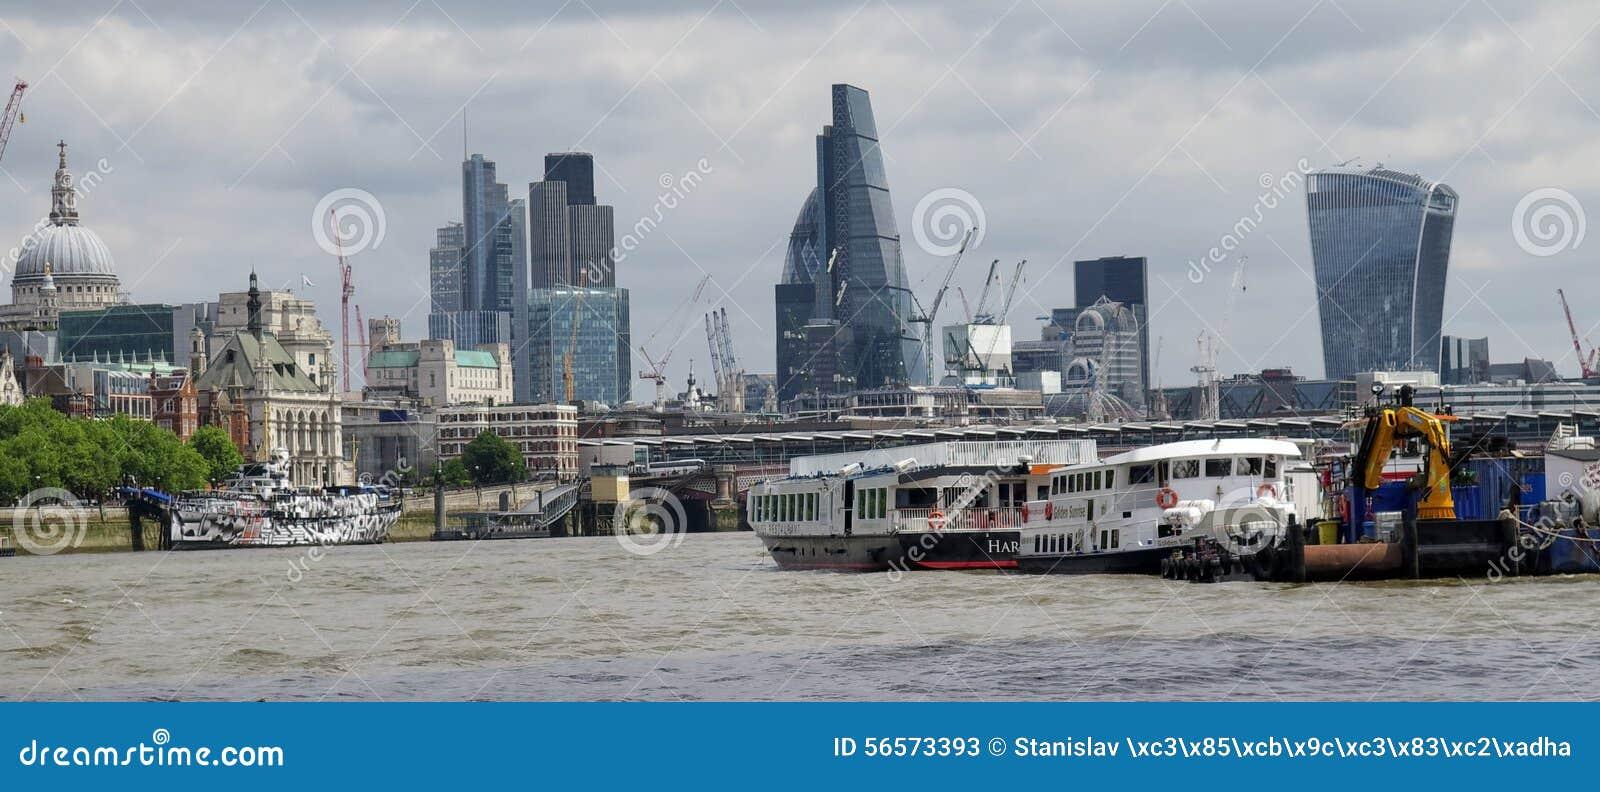 Download Λονδίνο - ποταμός Τάμεσης εκδοτική στοκ εικόνες. εικόνα από πύργος - 56573393